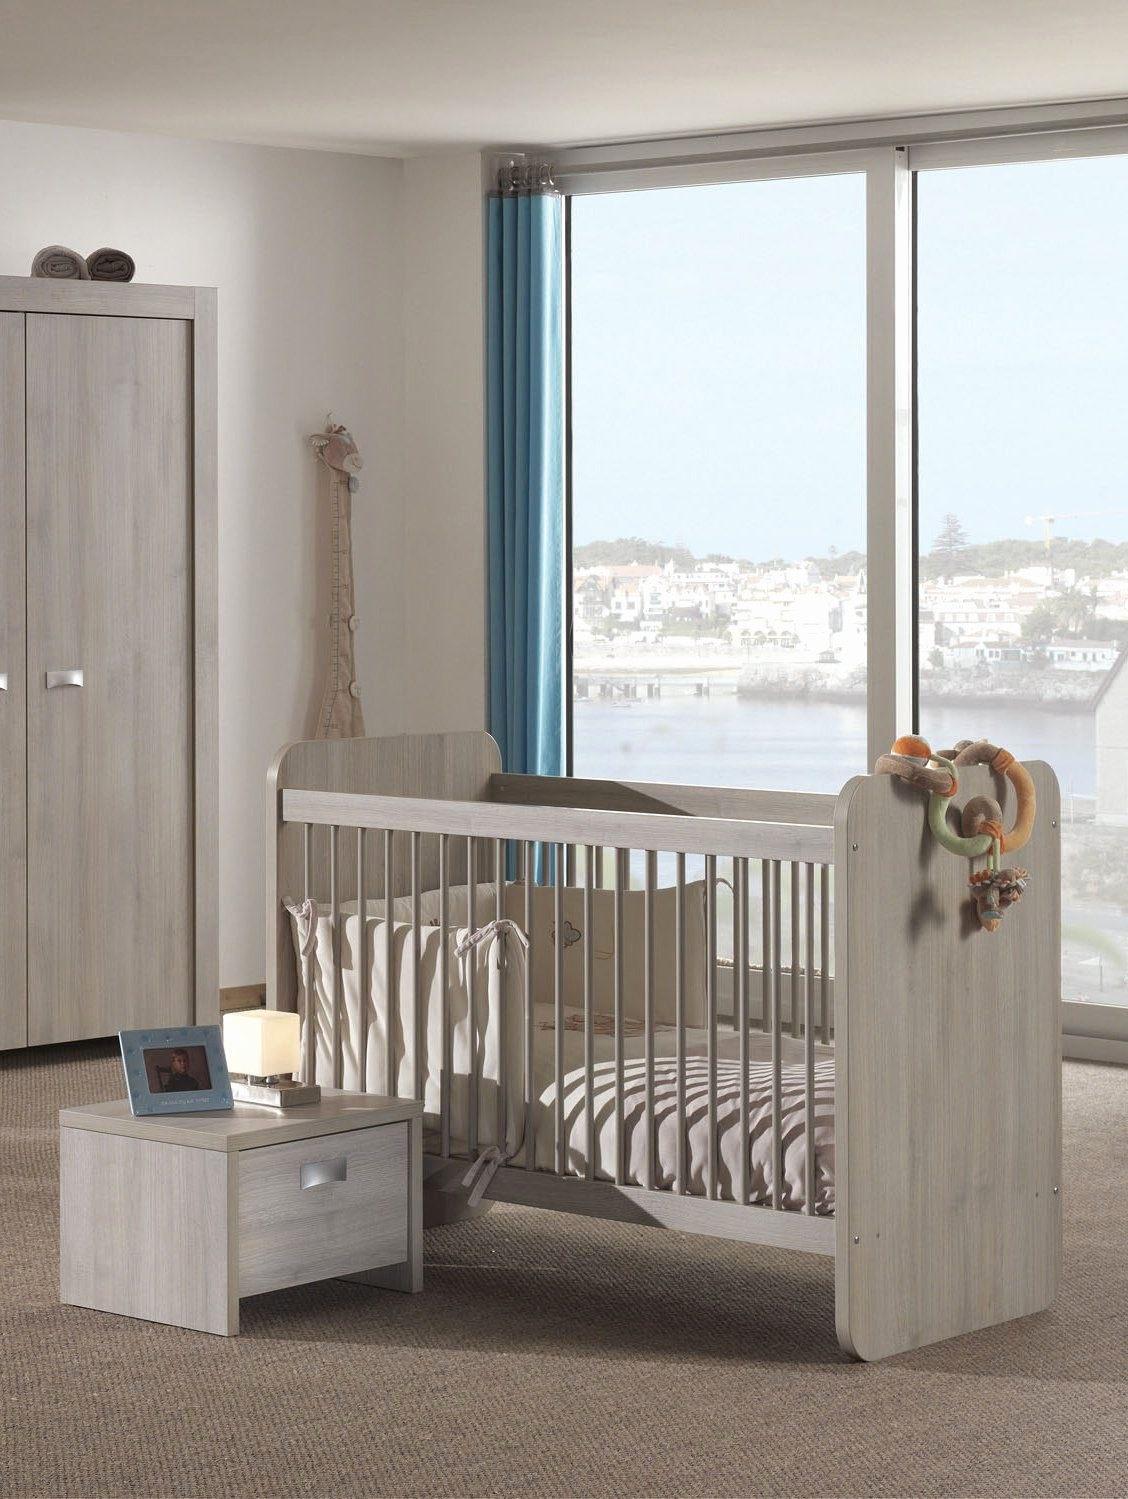 Lit b b autour de b b belle meuble b b ikea album b b original luxe parc b c3 a9b c3 a9 gris - Ikea meuble bebe ...